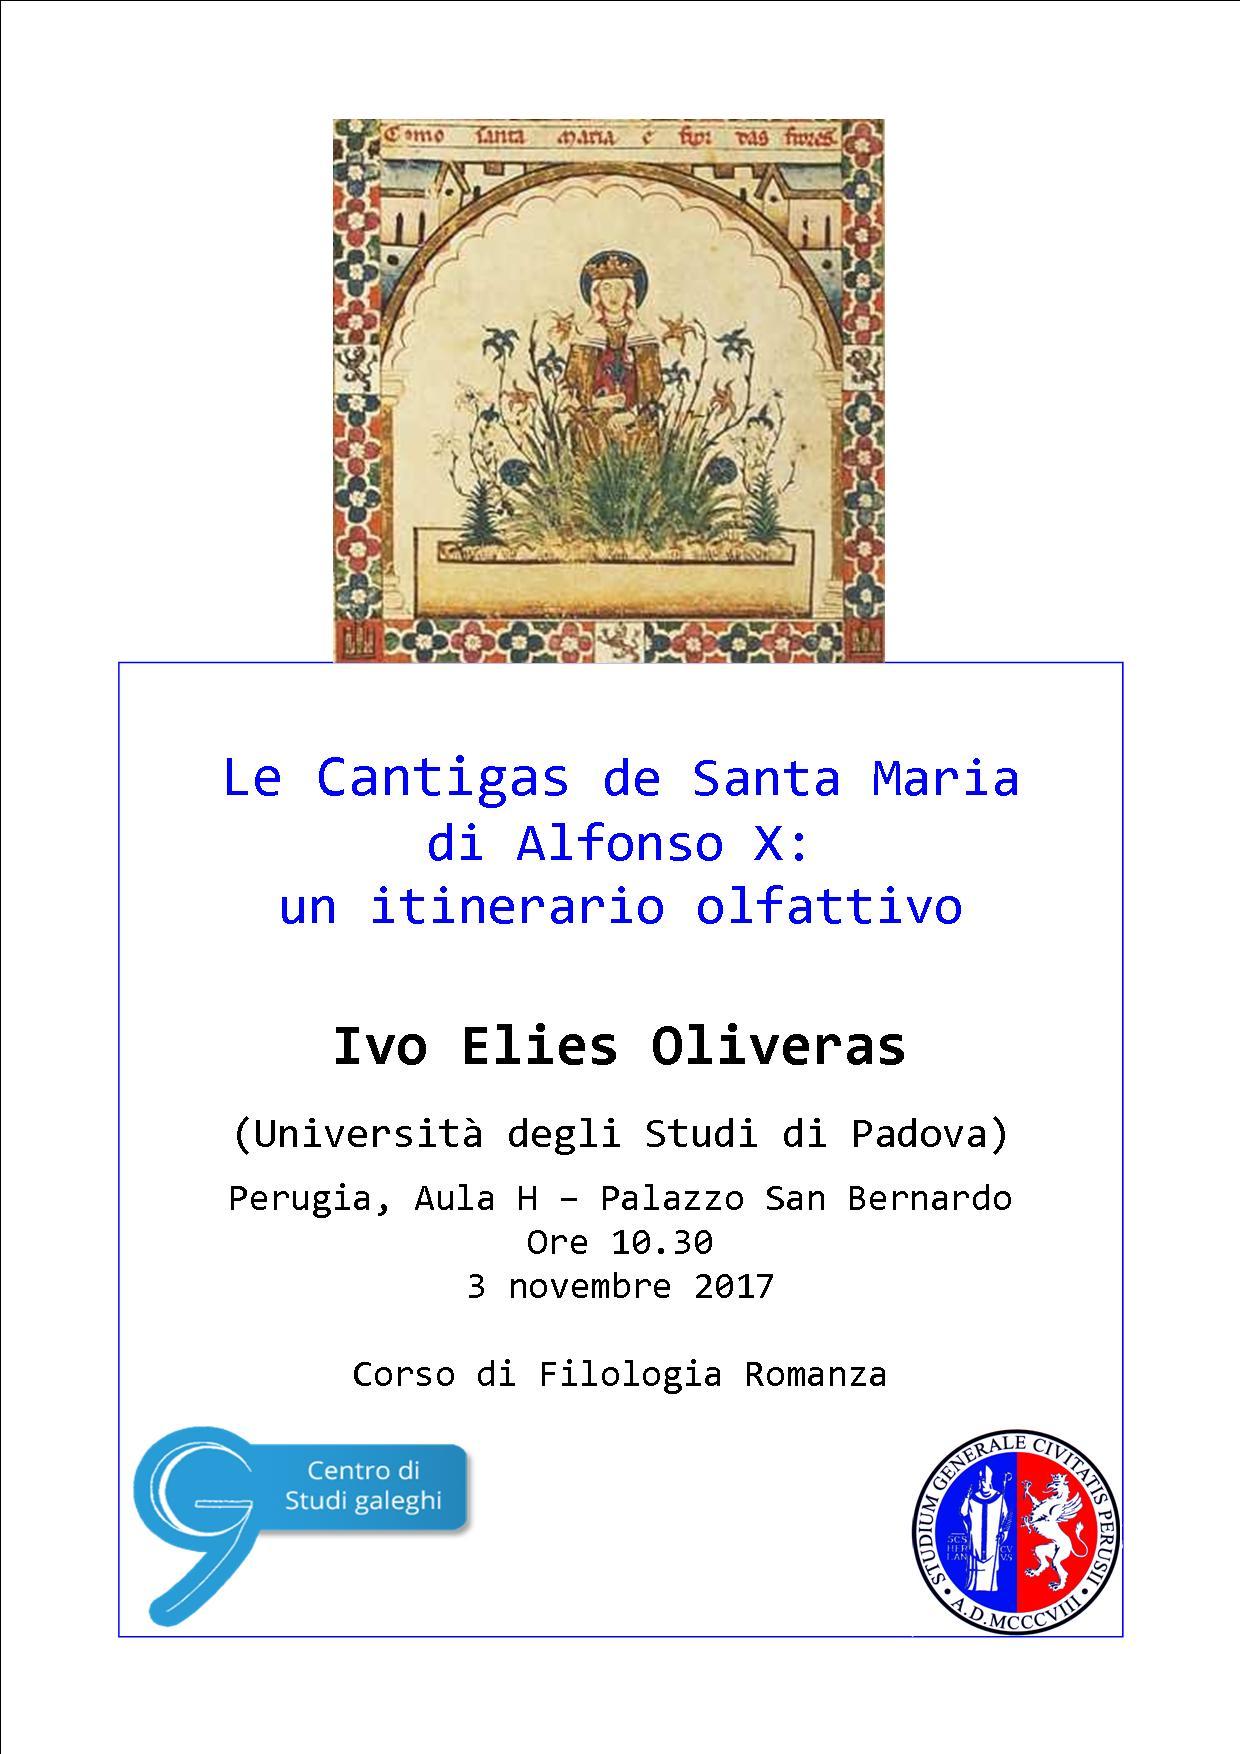 Conferenza – Ivo Elies Oliveras